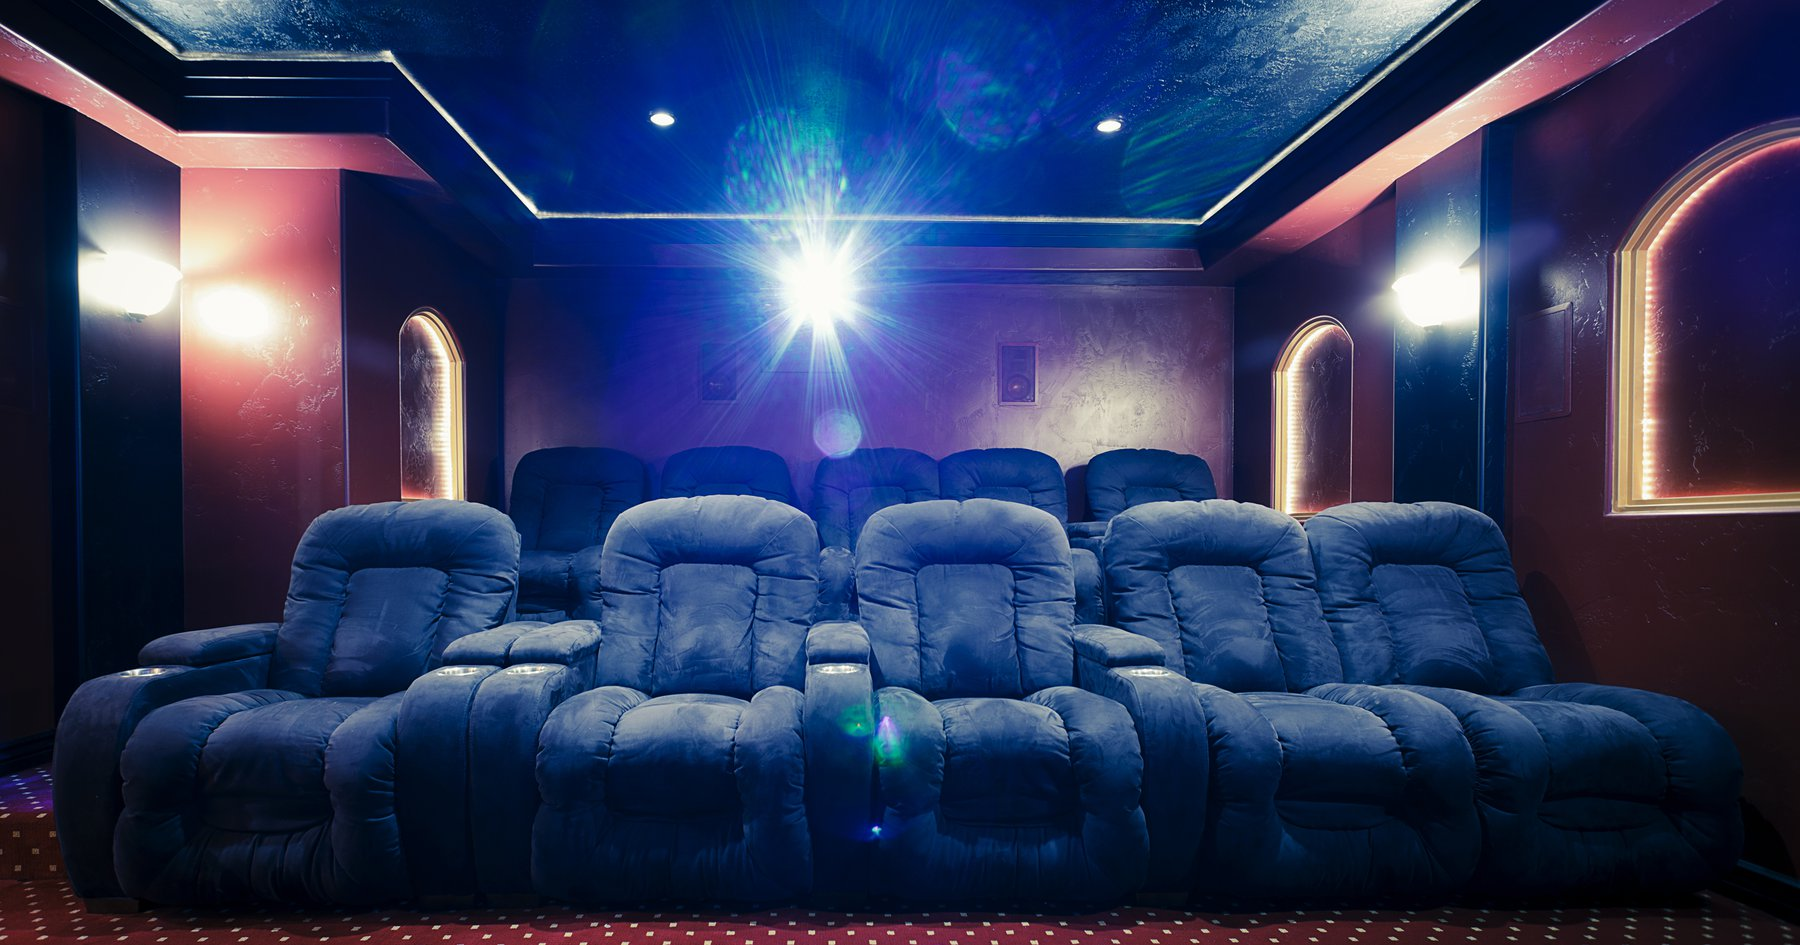 Kino Bayerischer Hof